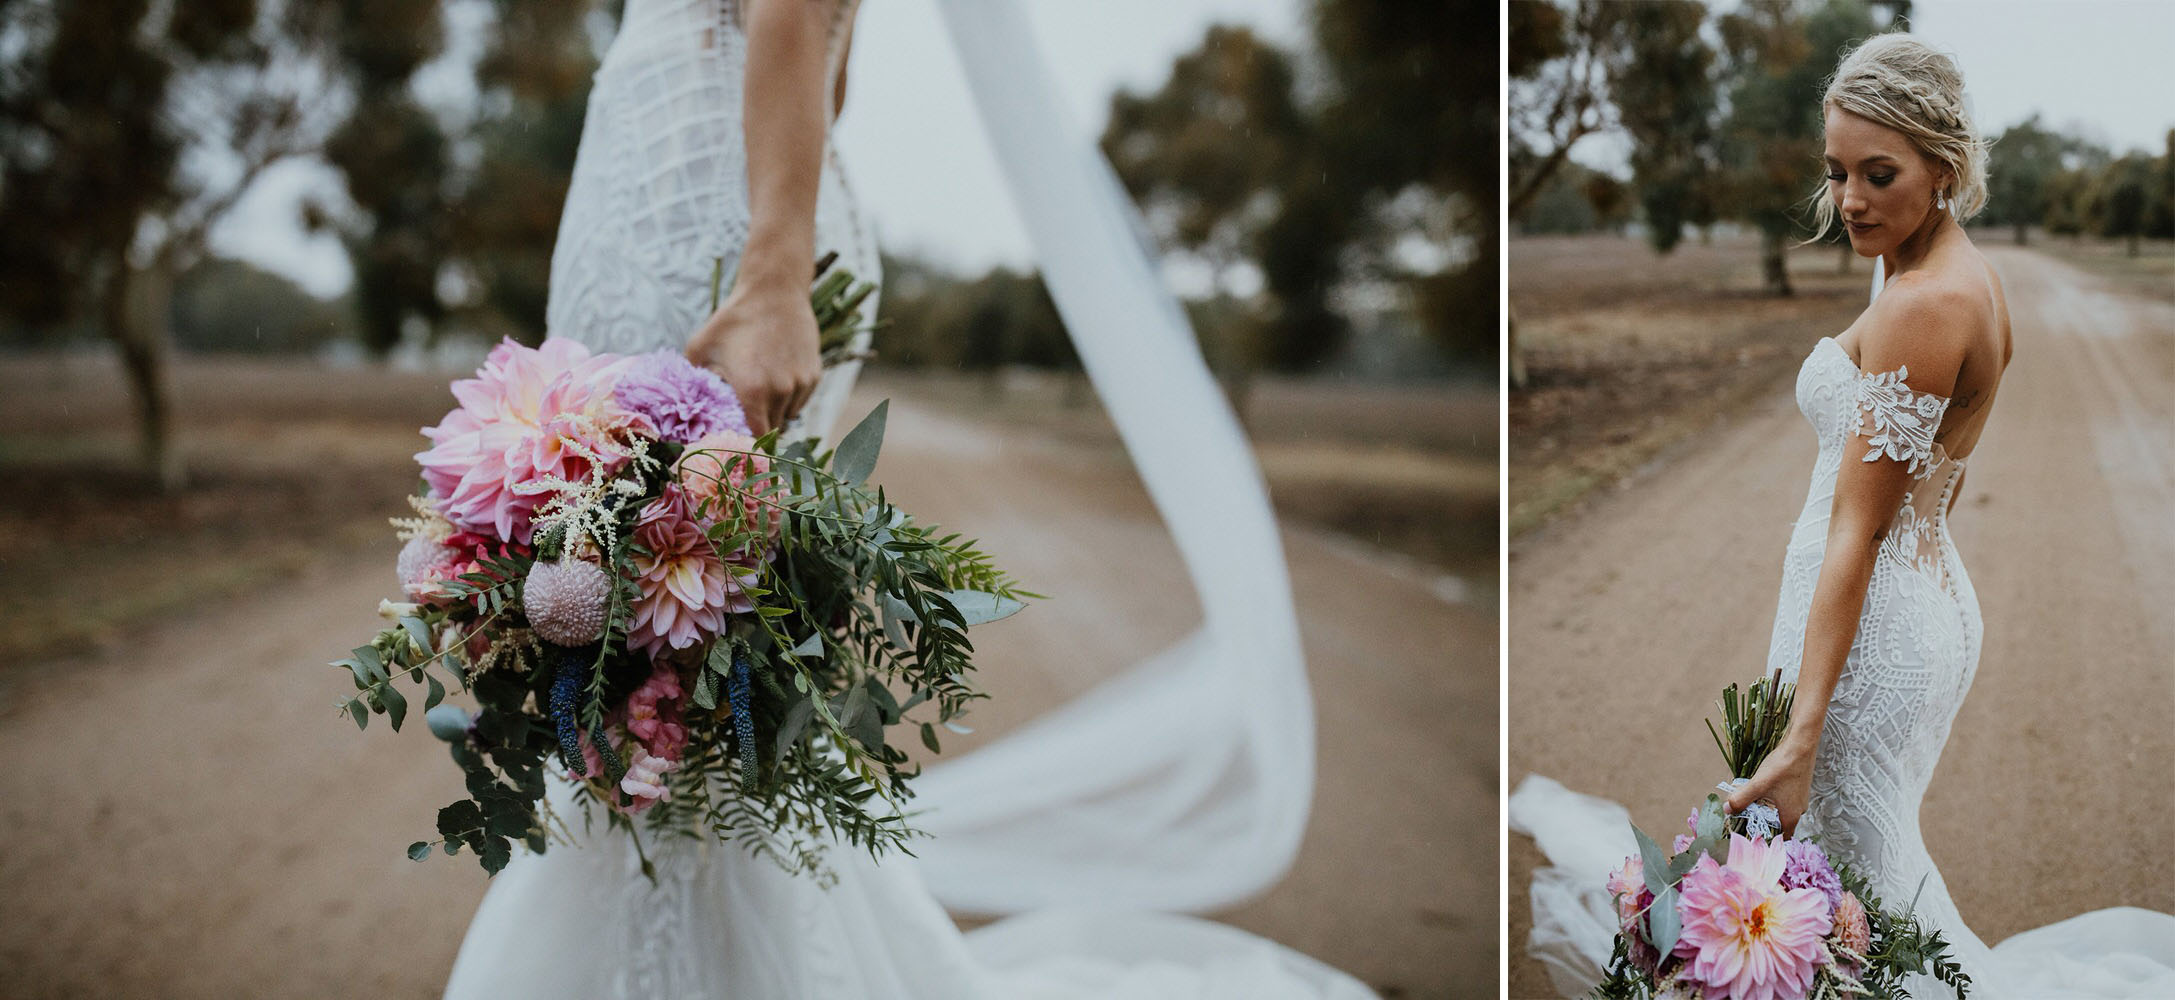 round-hill-homestead-culcairn-wedding-71.jpg